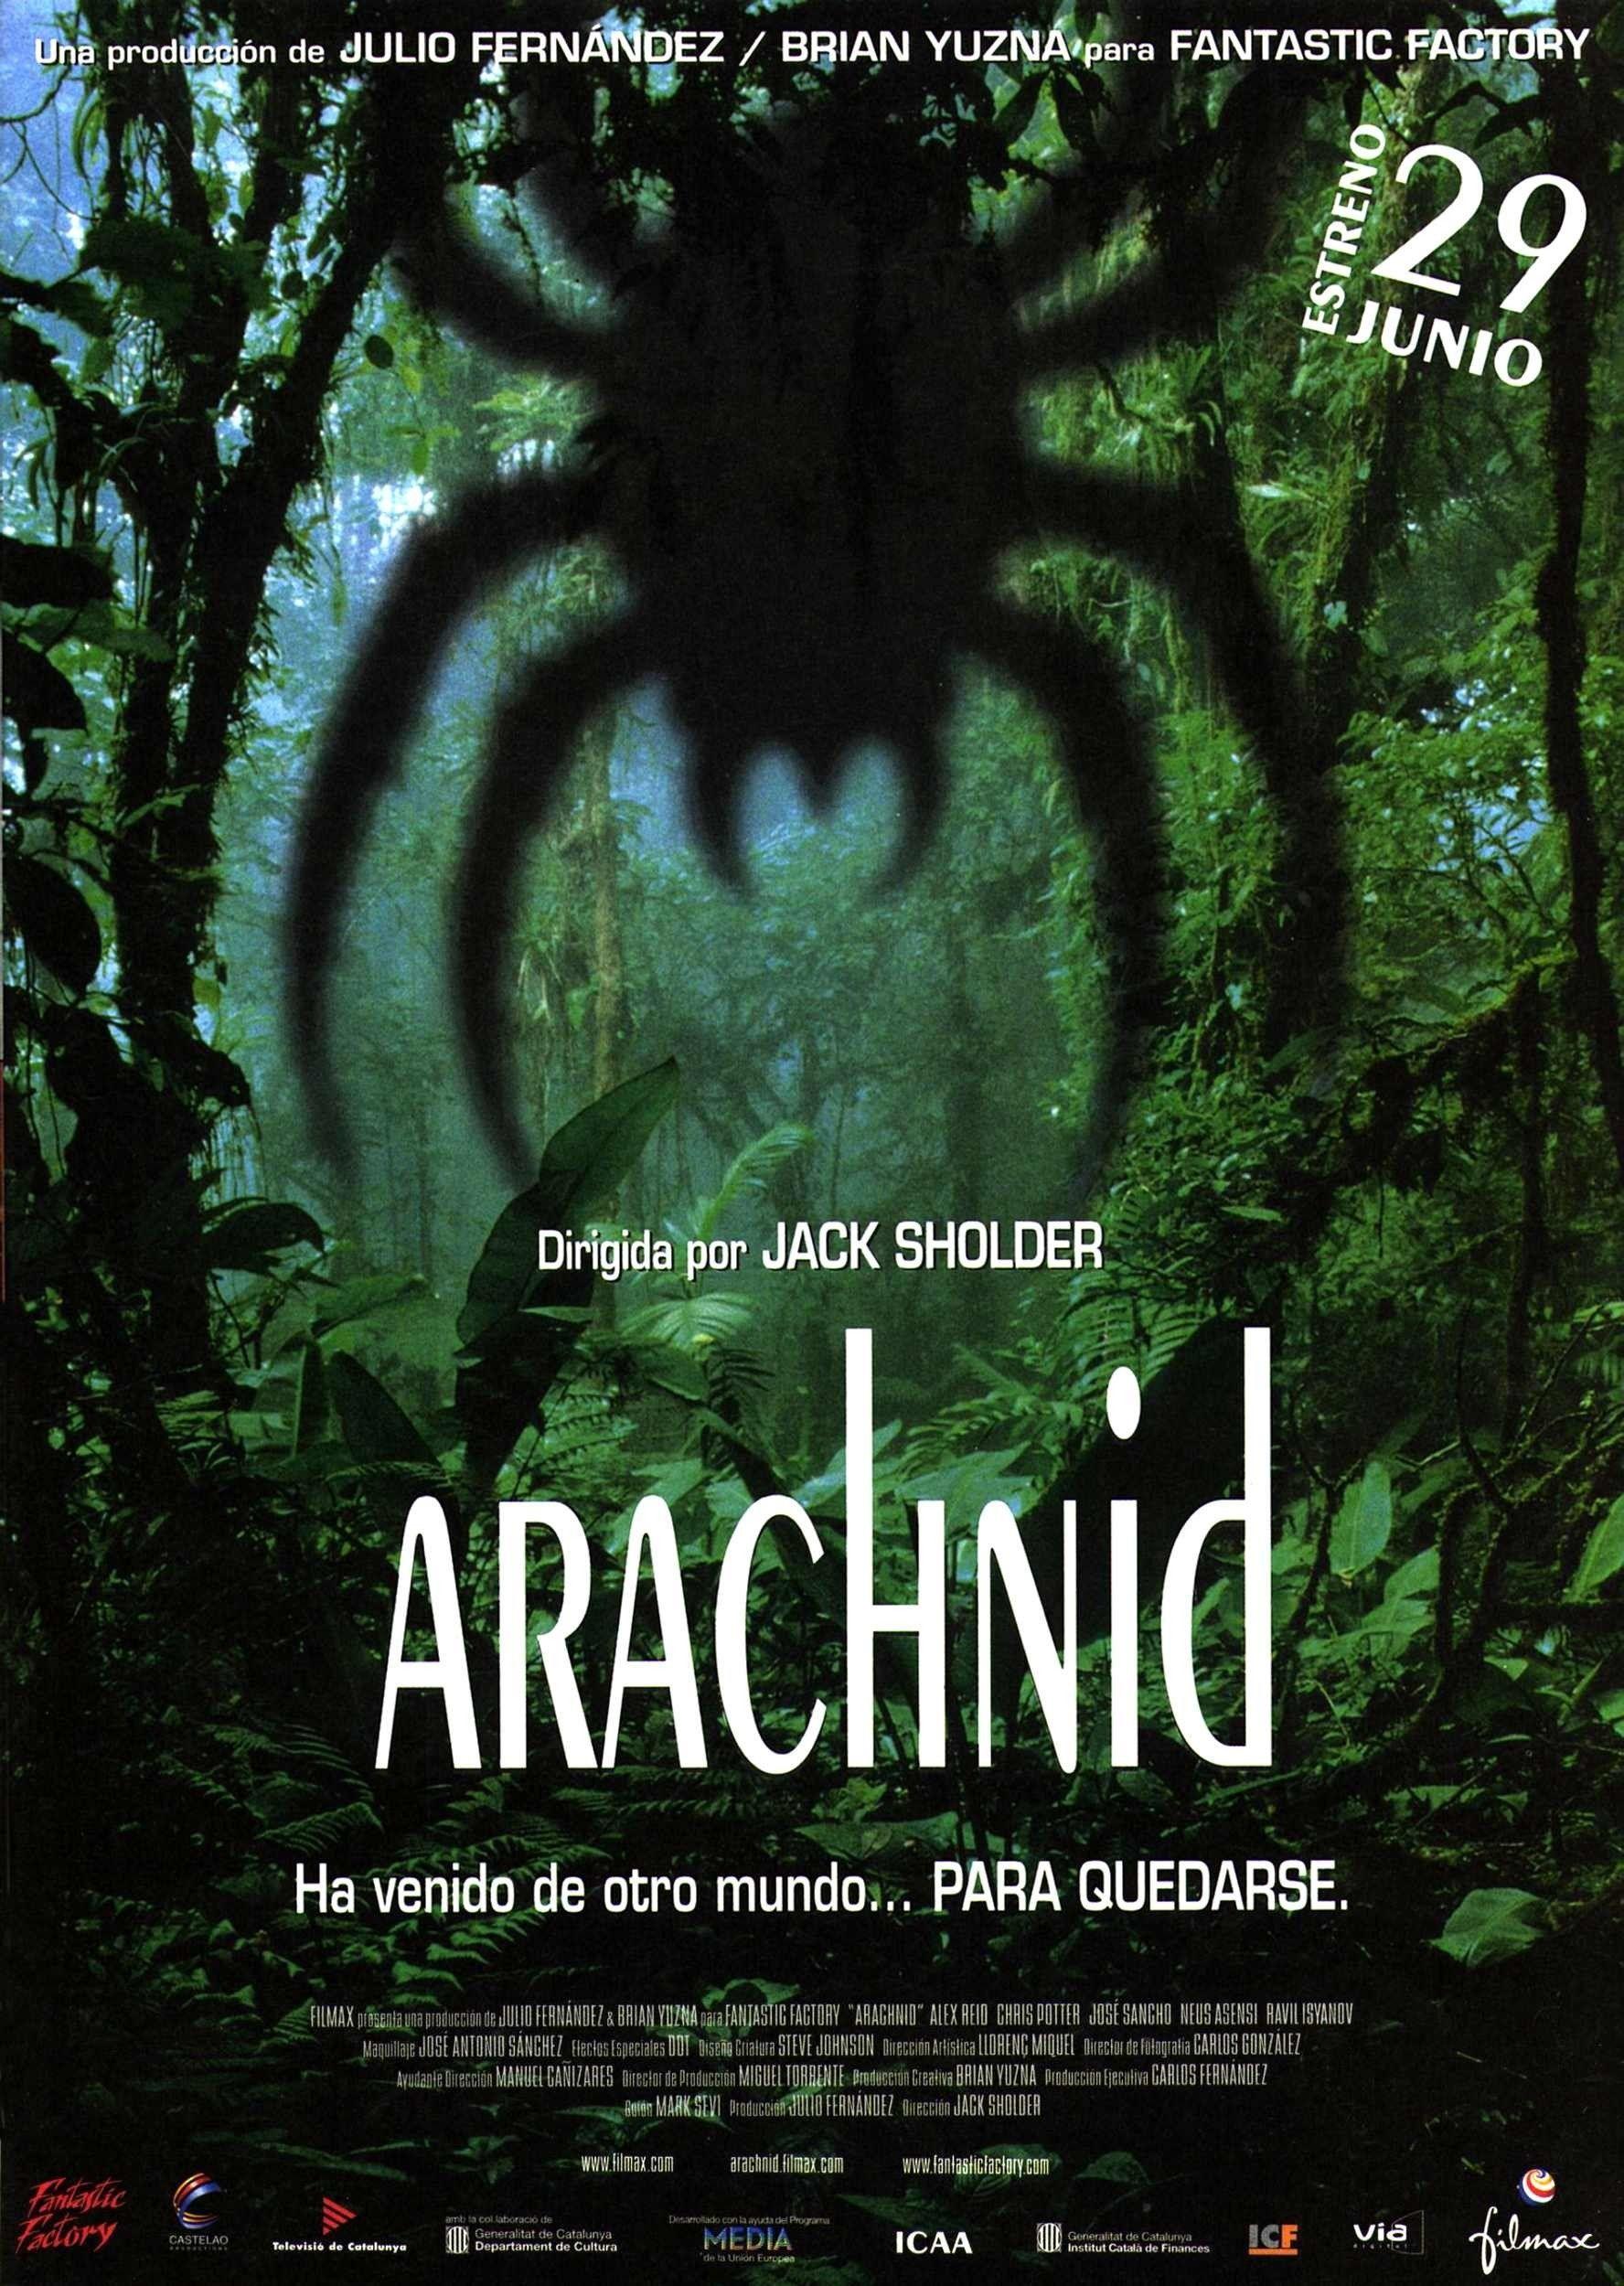 Arachnid 2001 horror films film movie covers